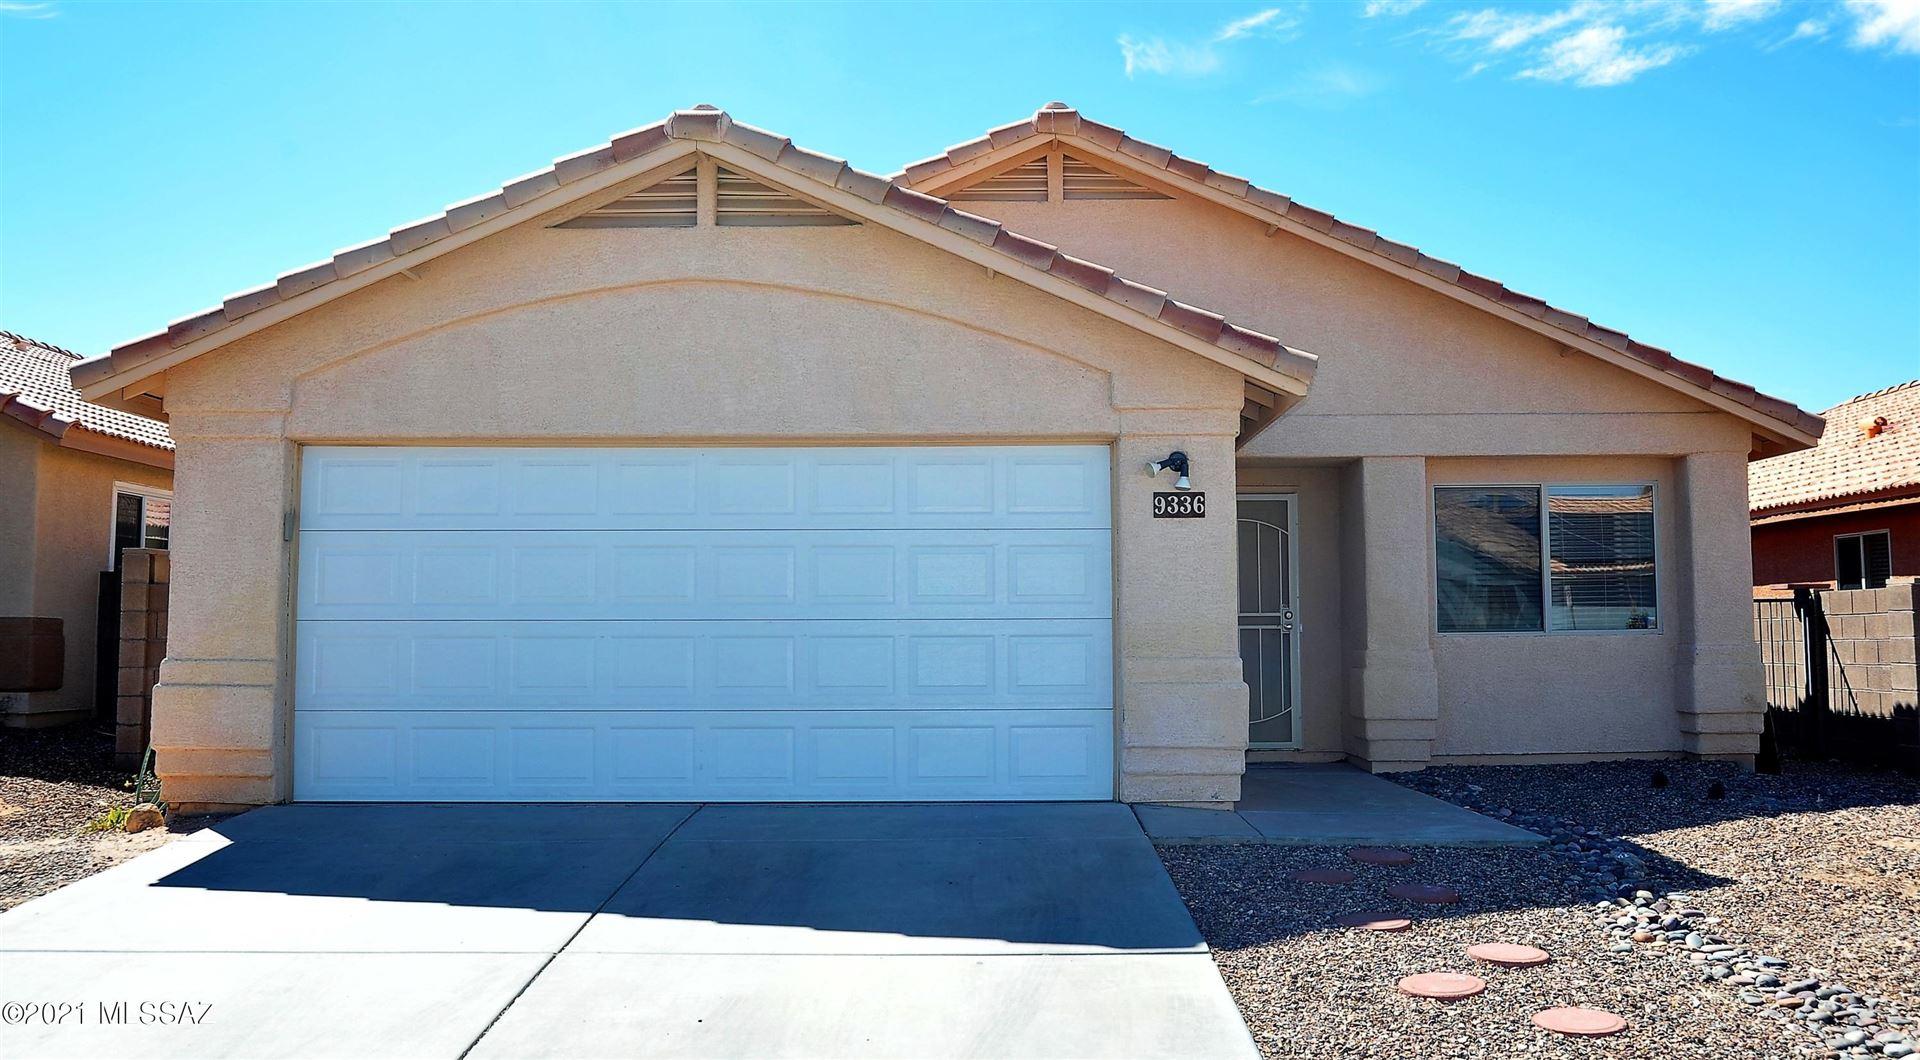 9336 E Marcasite Lane, Tucson, AZ 85747 - MLS#: 22105010